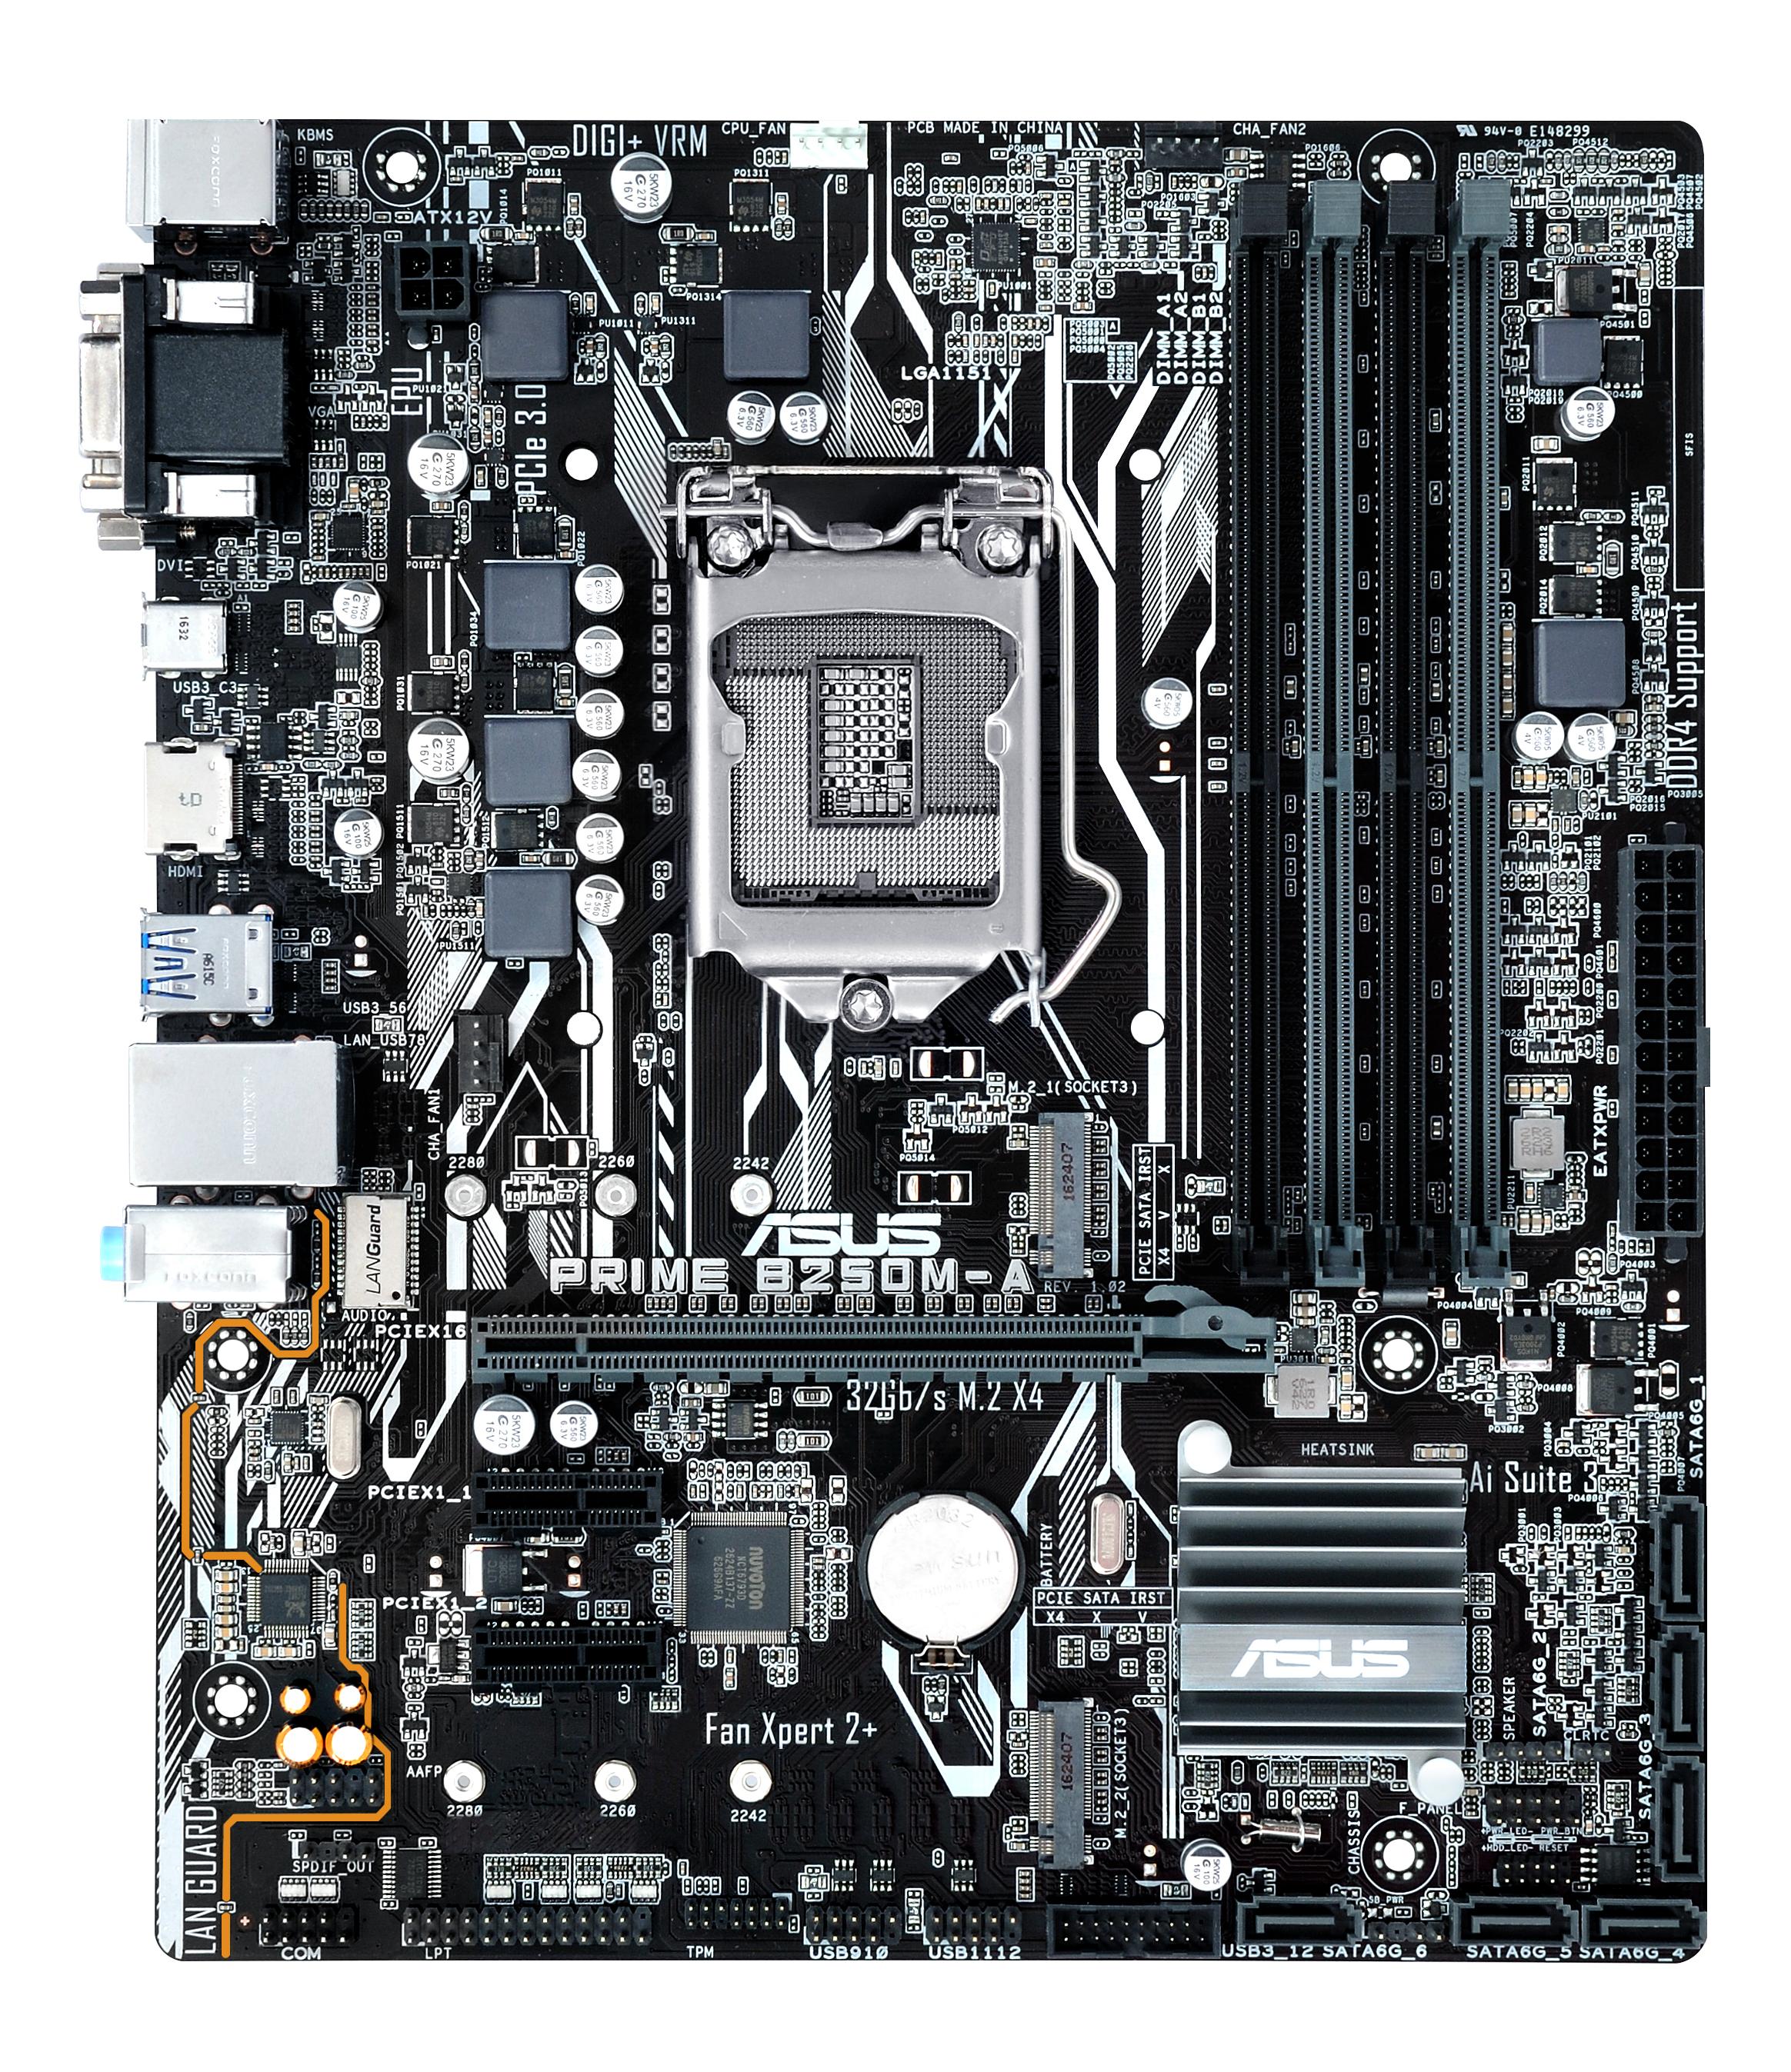 ASUS MB PRIME-B250M-A INTEL MICRO-ATX REALTEK ALC 887 2400 MHZ (LGA 1151) 1 x DVI 1 x HDMI 1 x VGA